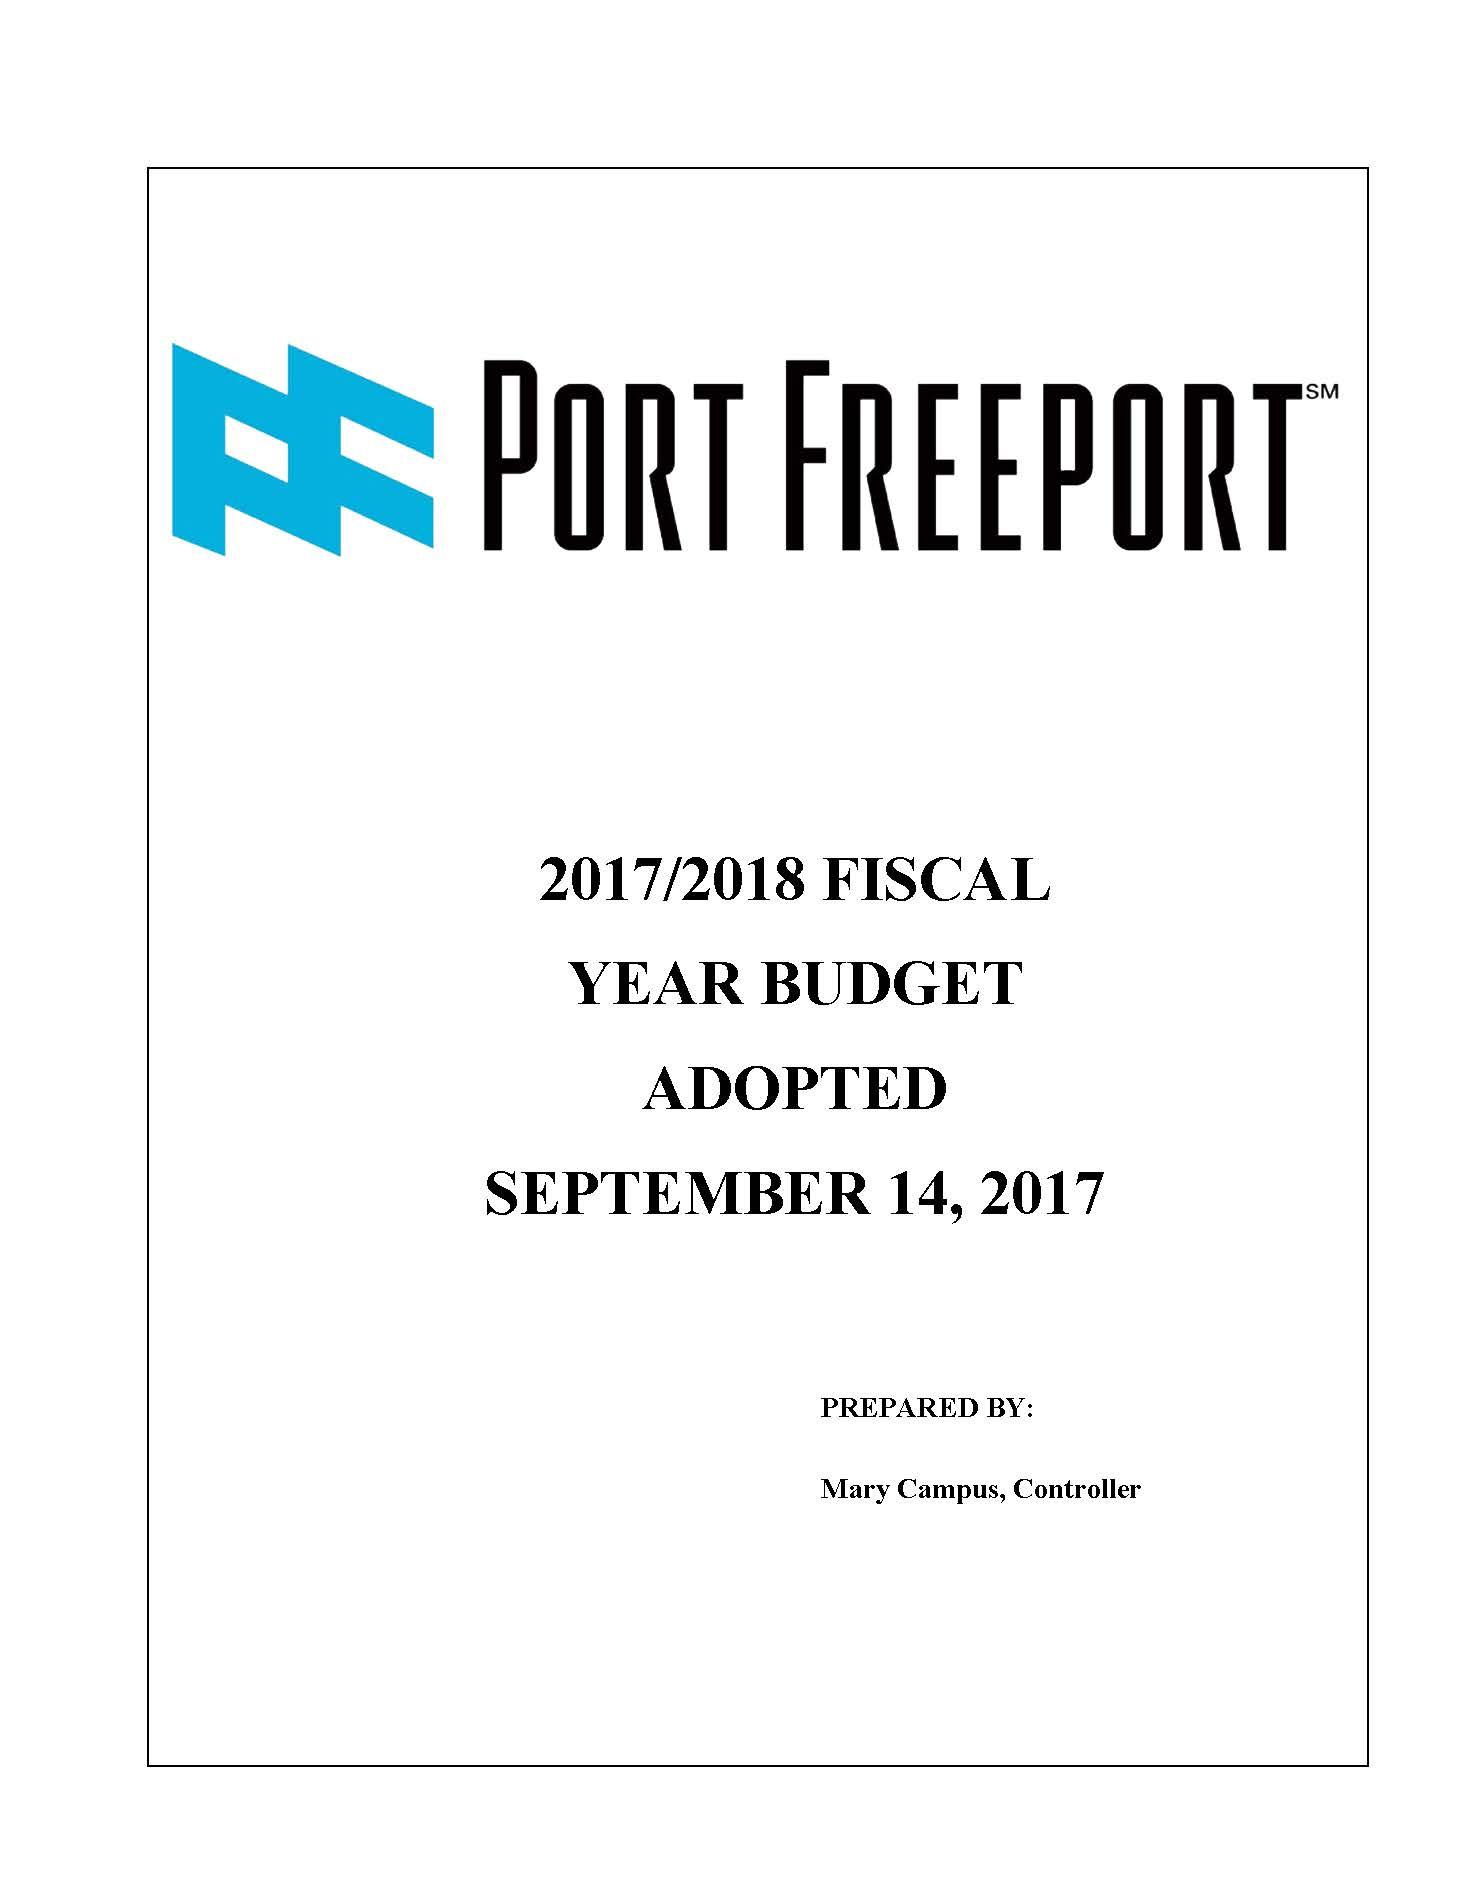 2017-2018 Port Freeport Budget